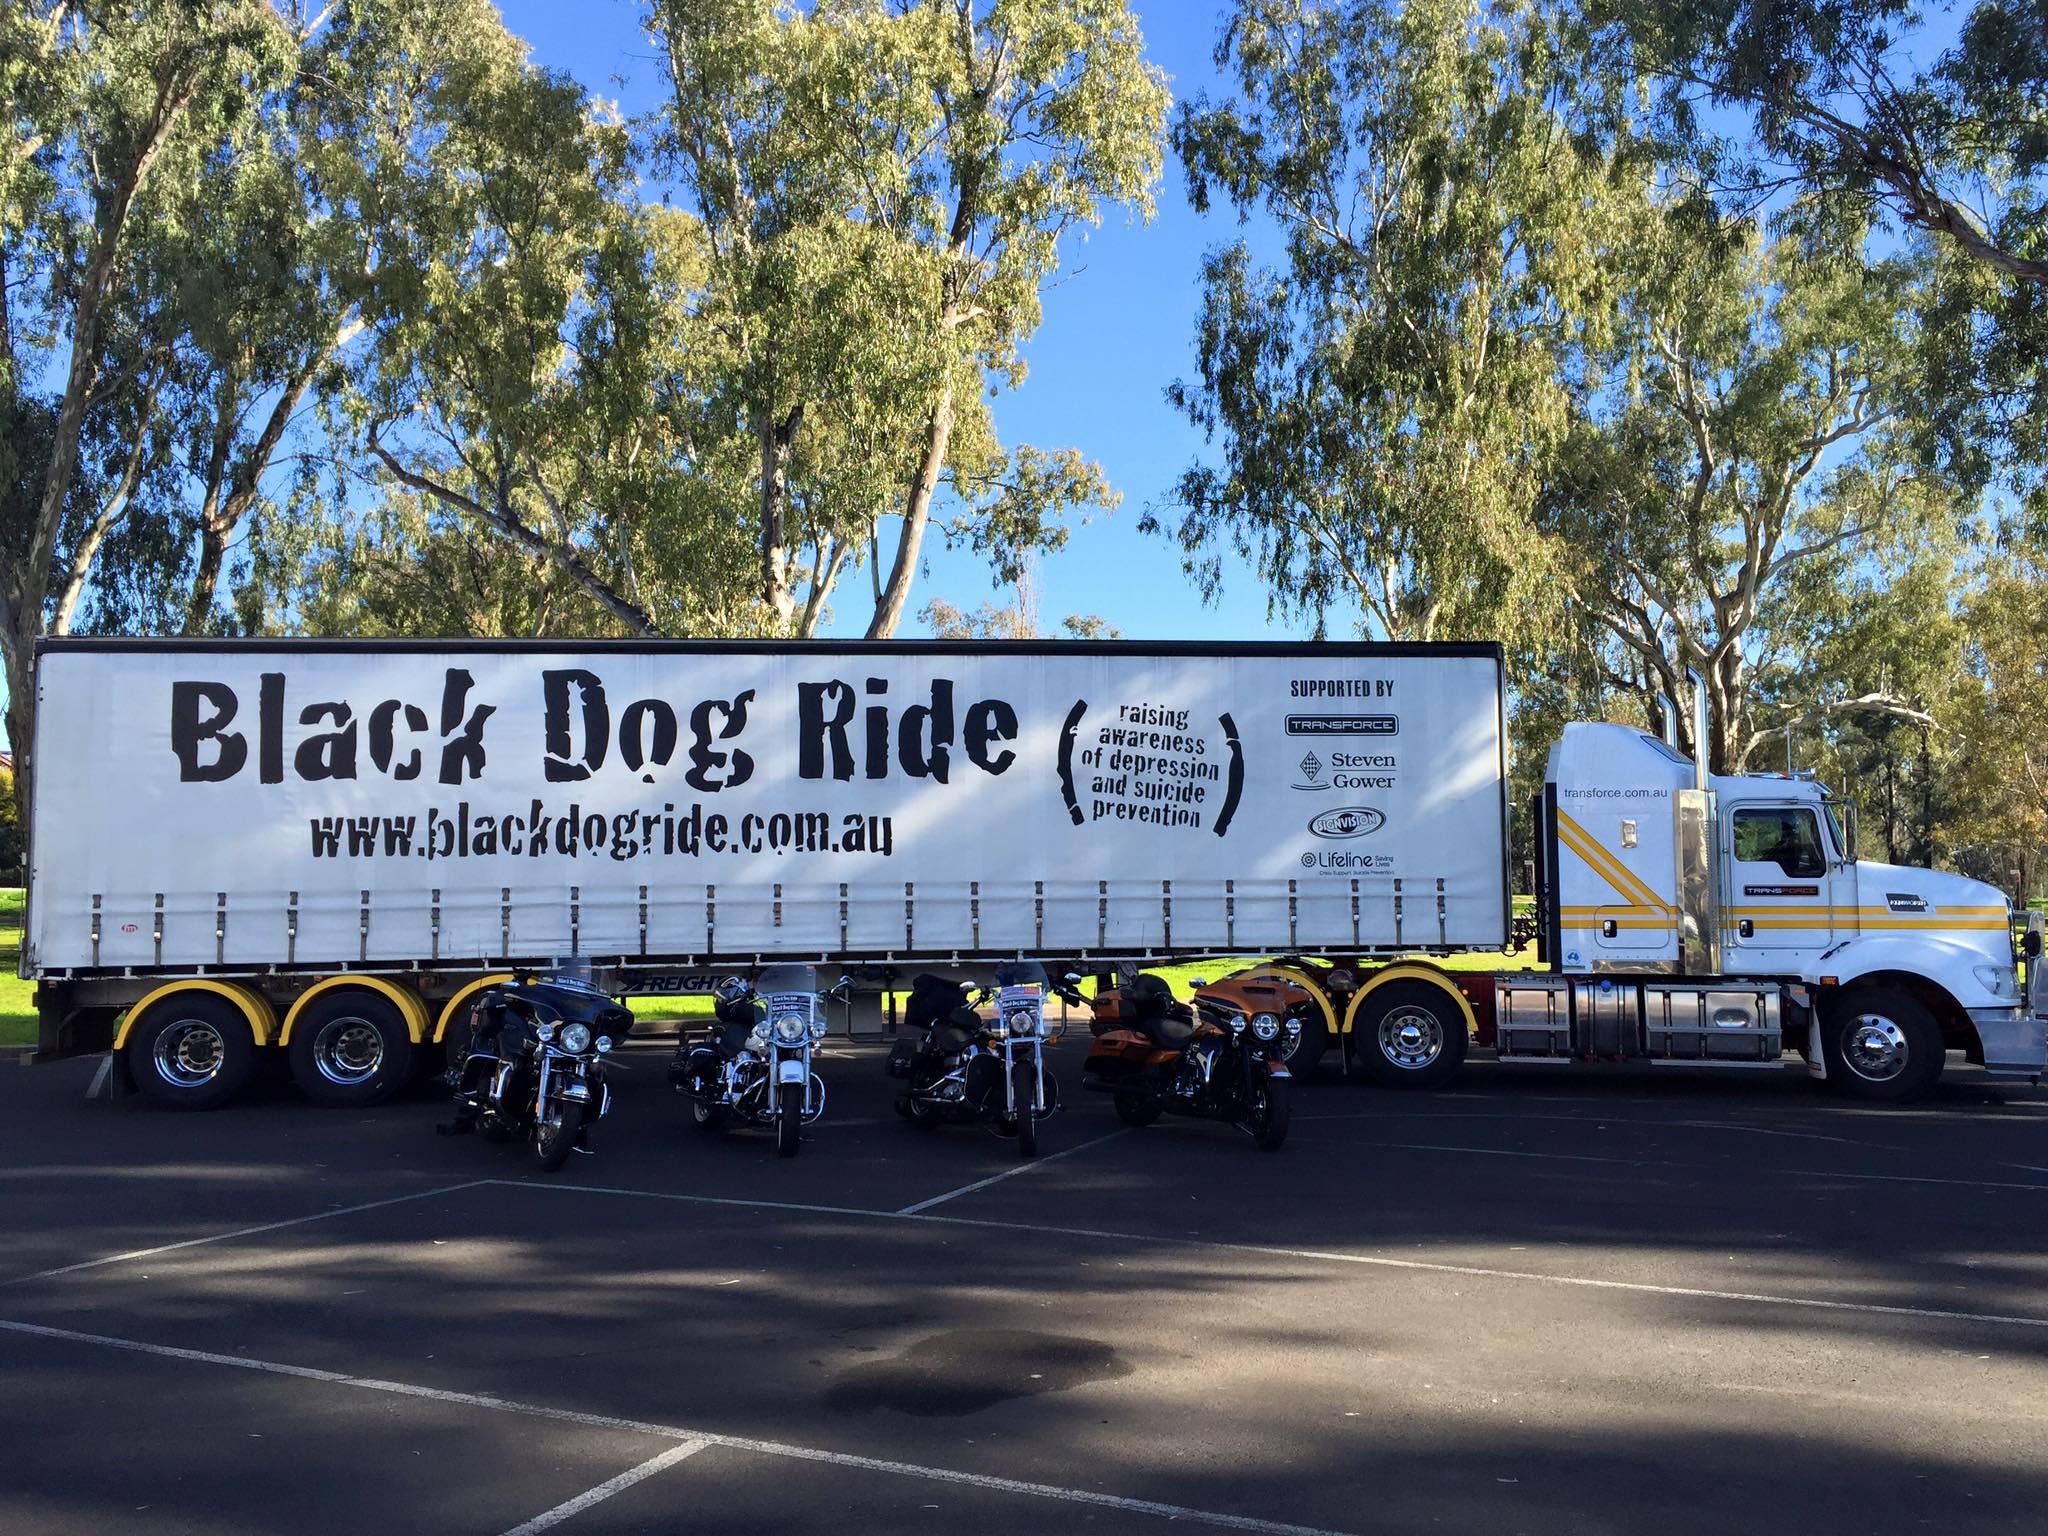 Black Dog Ride